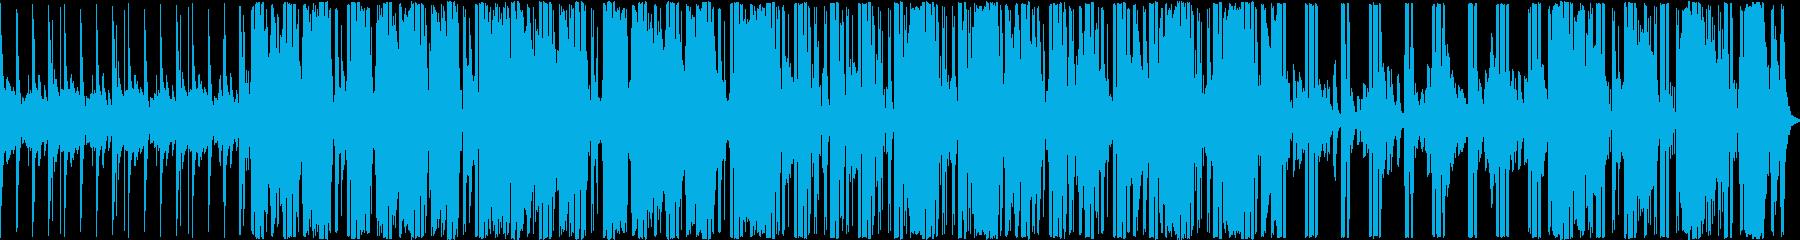 electronicaですの再生済みの波形